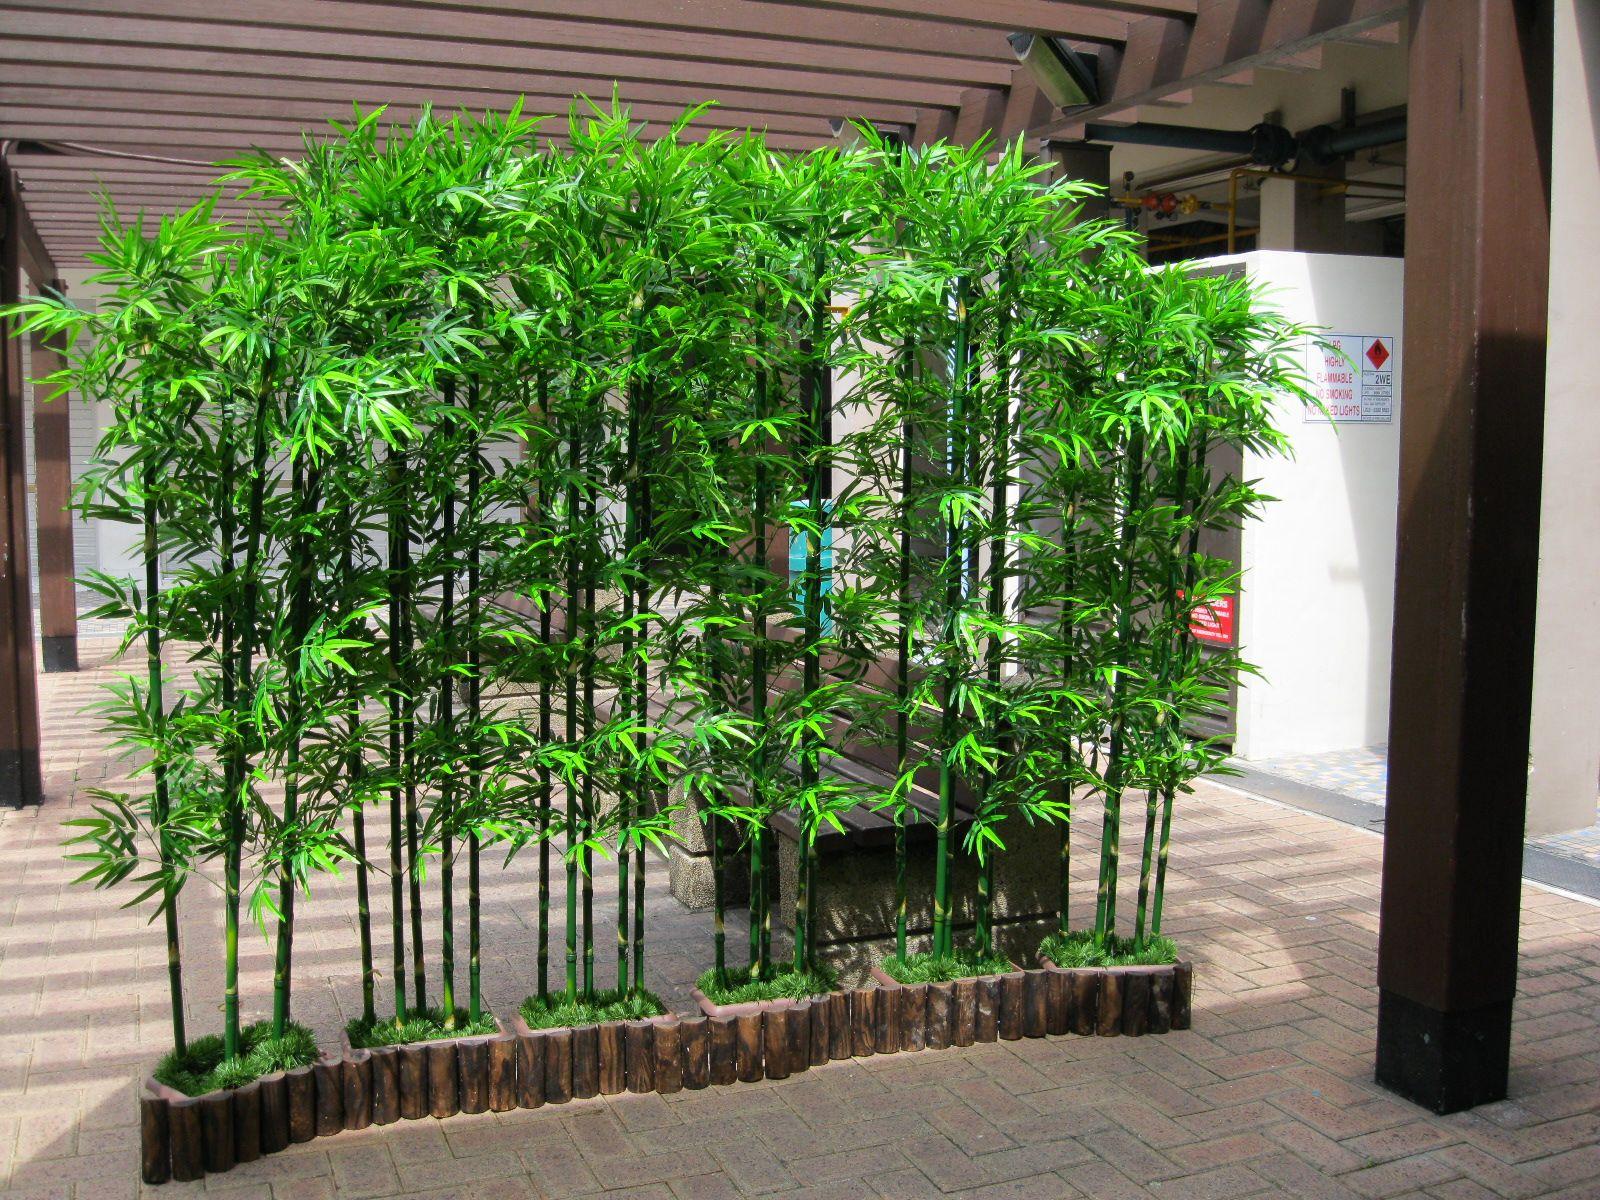 Bamboo Planters Ideas | Hoi Kee Flower Shop: Bamboo ...